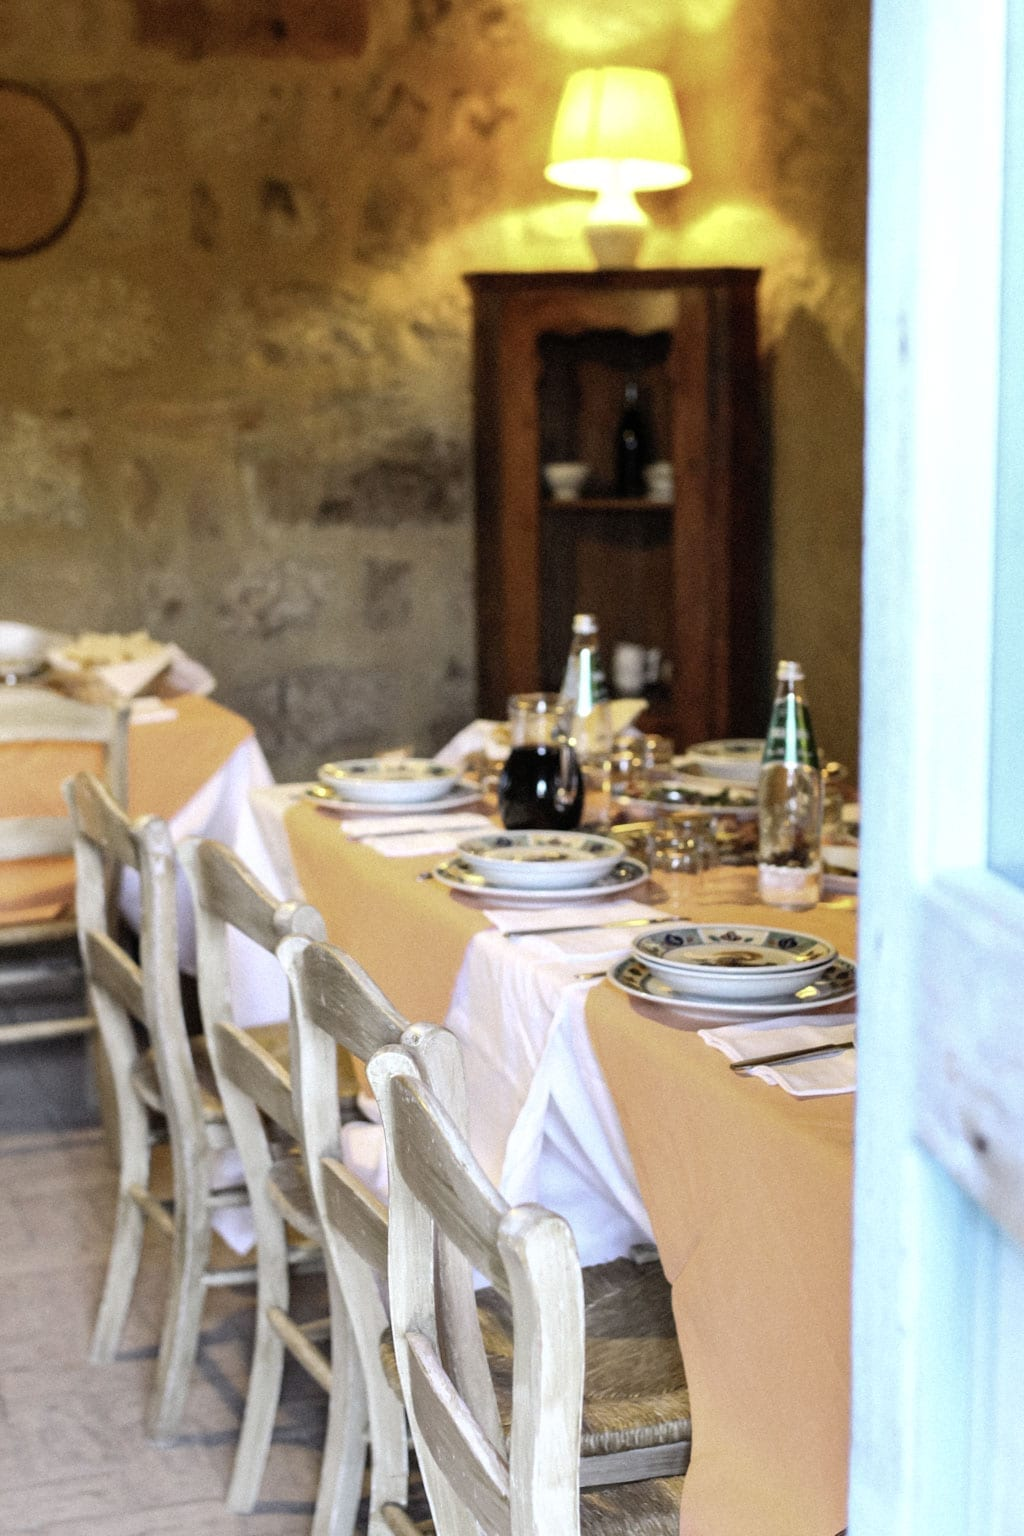 CK-1606_Sardinien-Sardegna-Sardinia-Italy-Italia-Fashion-Blog-Sun-Down-Dress-Blonde-Karin-Kaswurm-9881